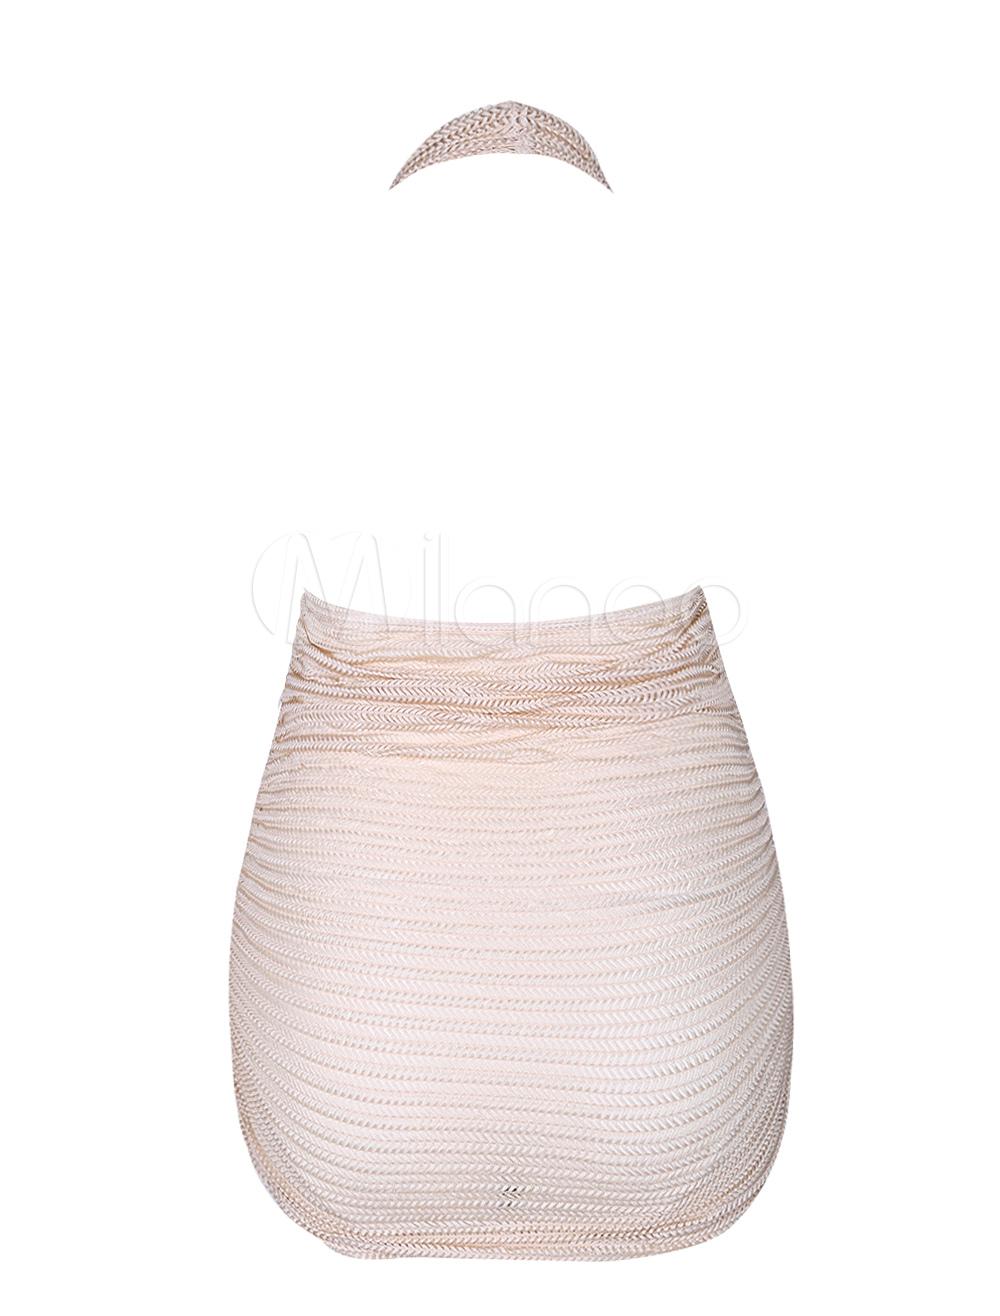 V Neck Asymmetric Hem Floral Printed Long Sleeve Maxi Dresses rose gold with tassels